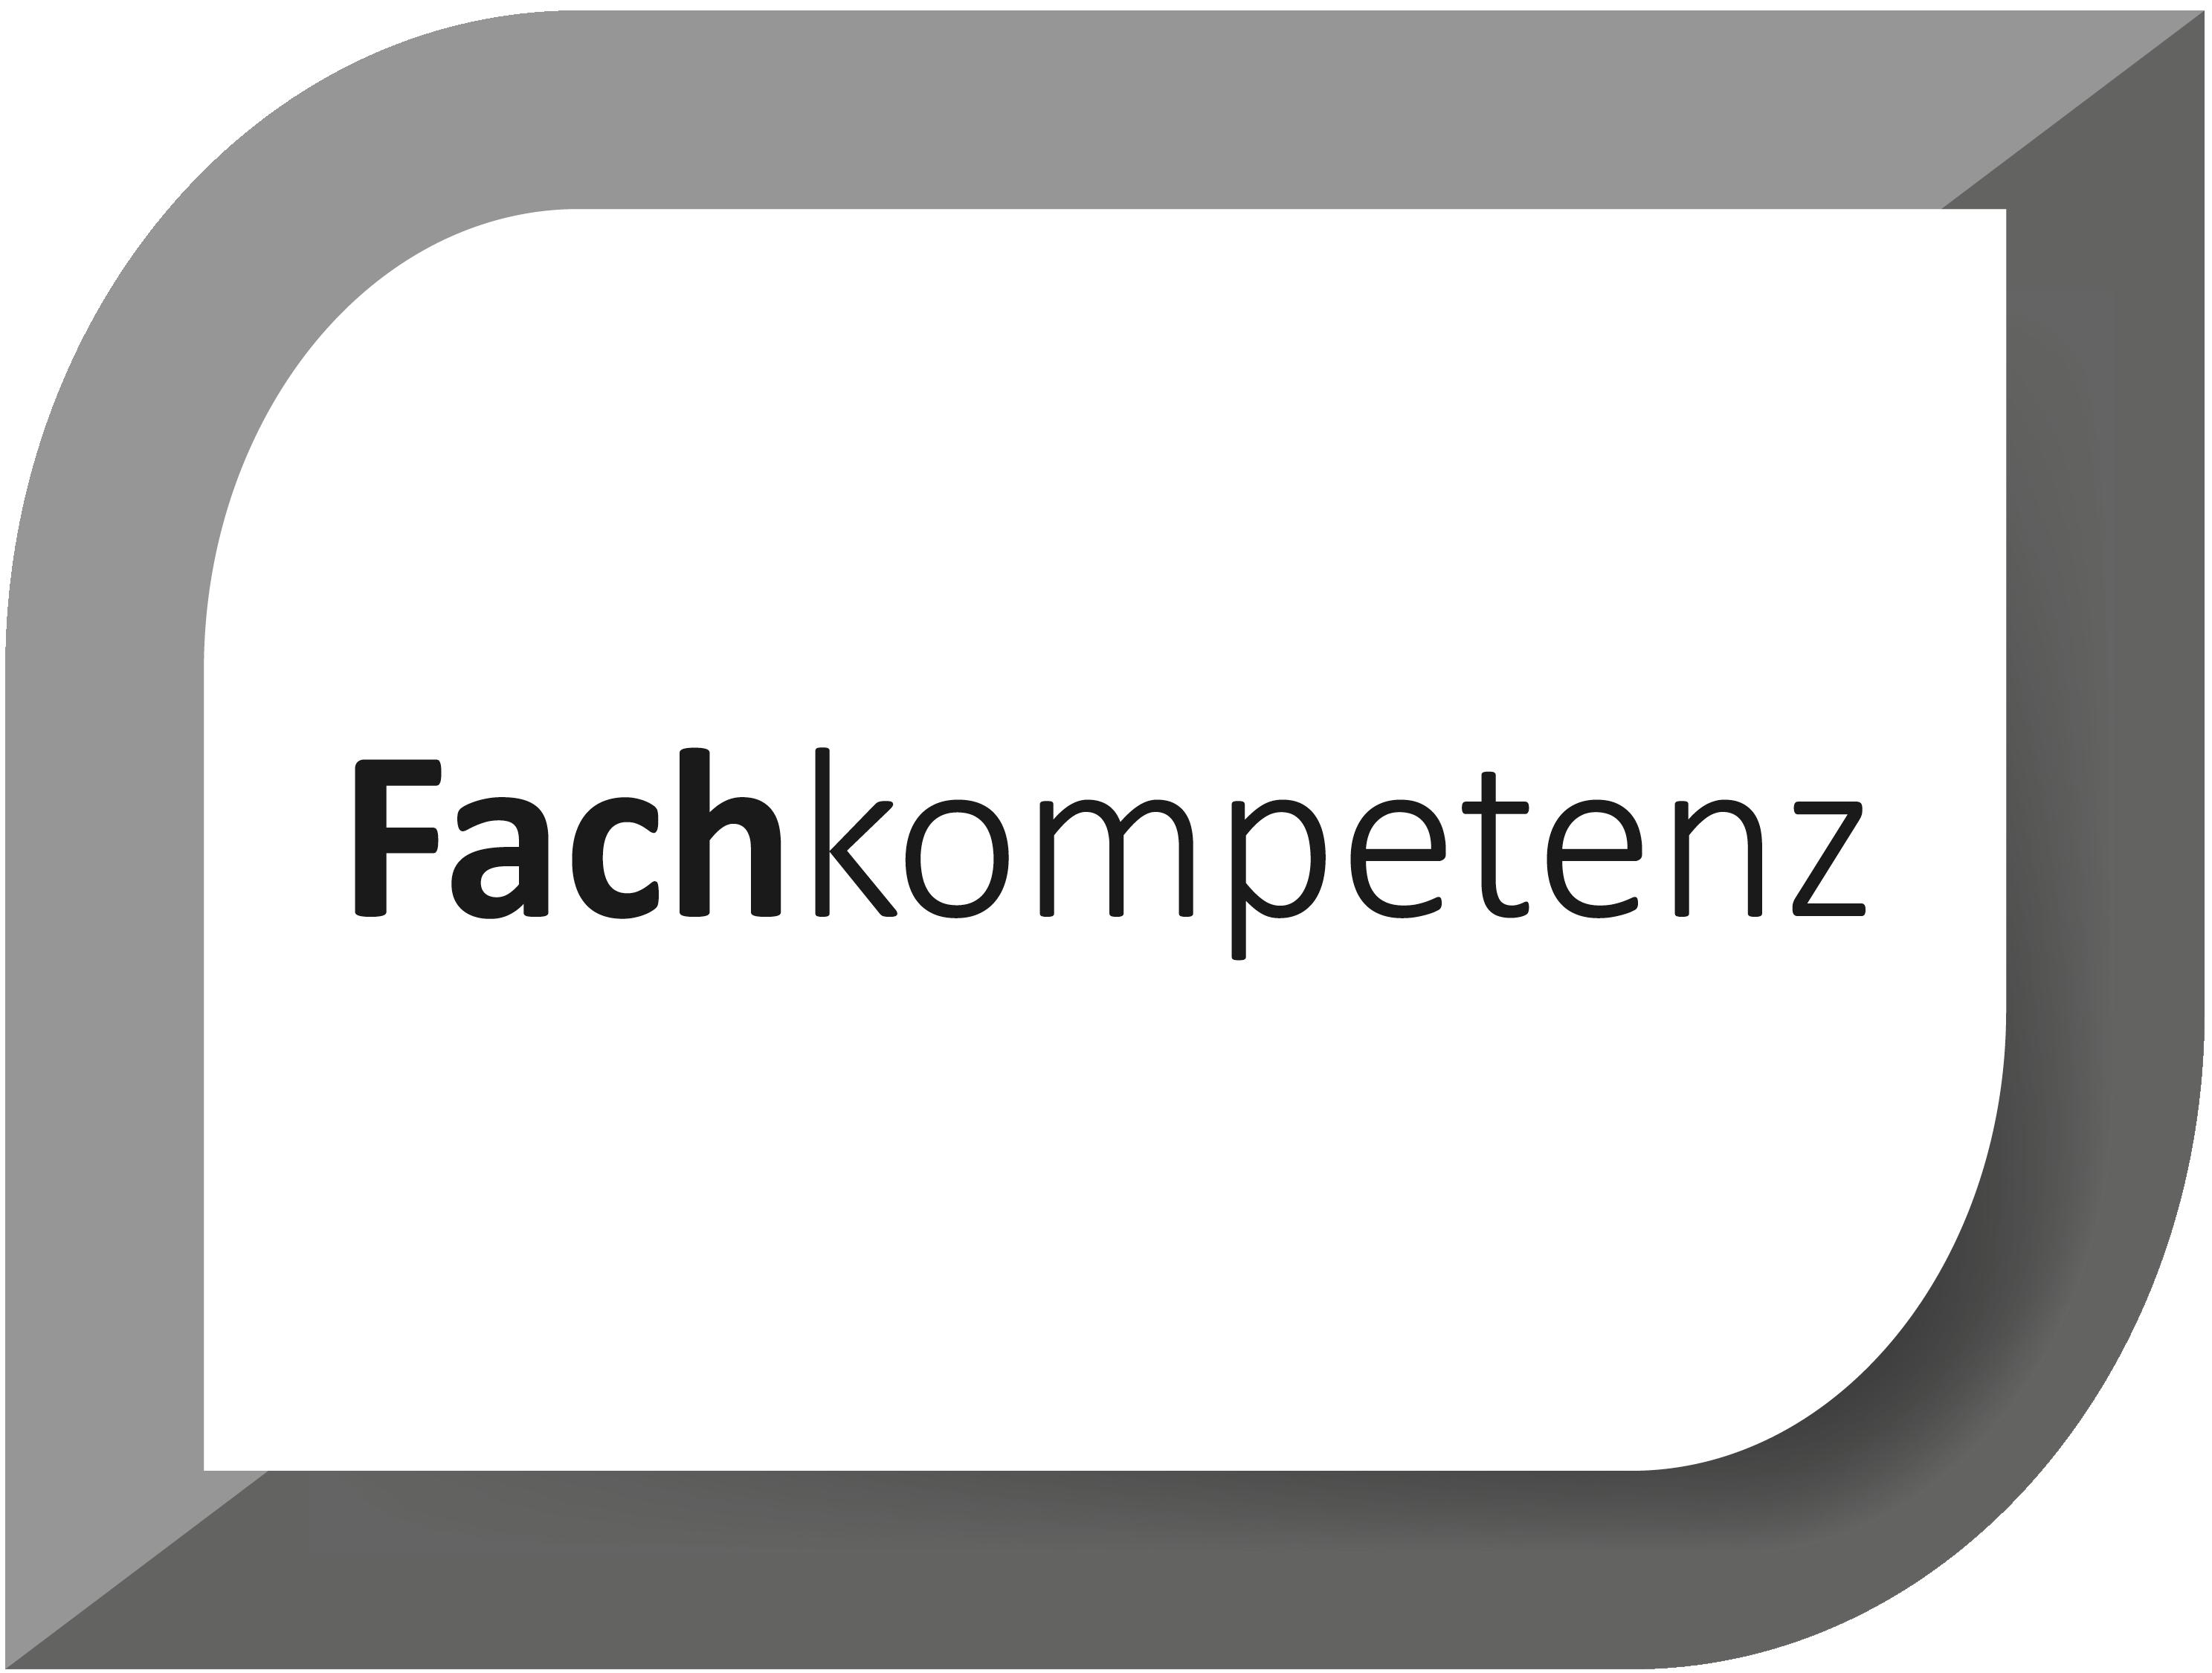 Button-Pastell_Fachkompetenz